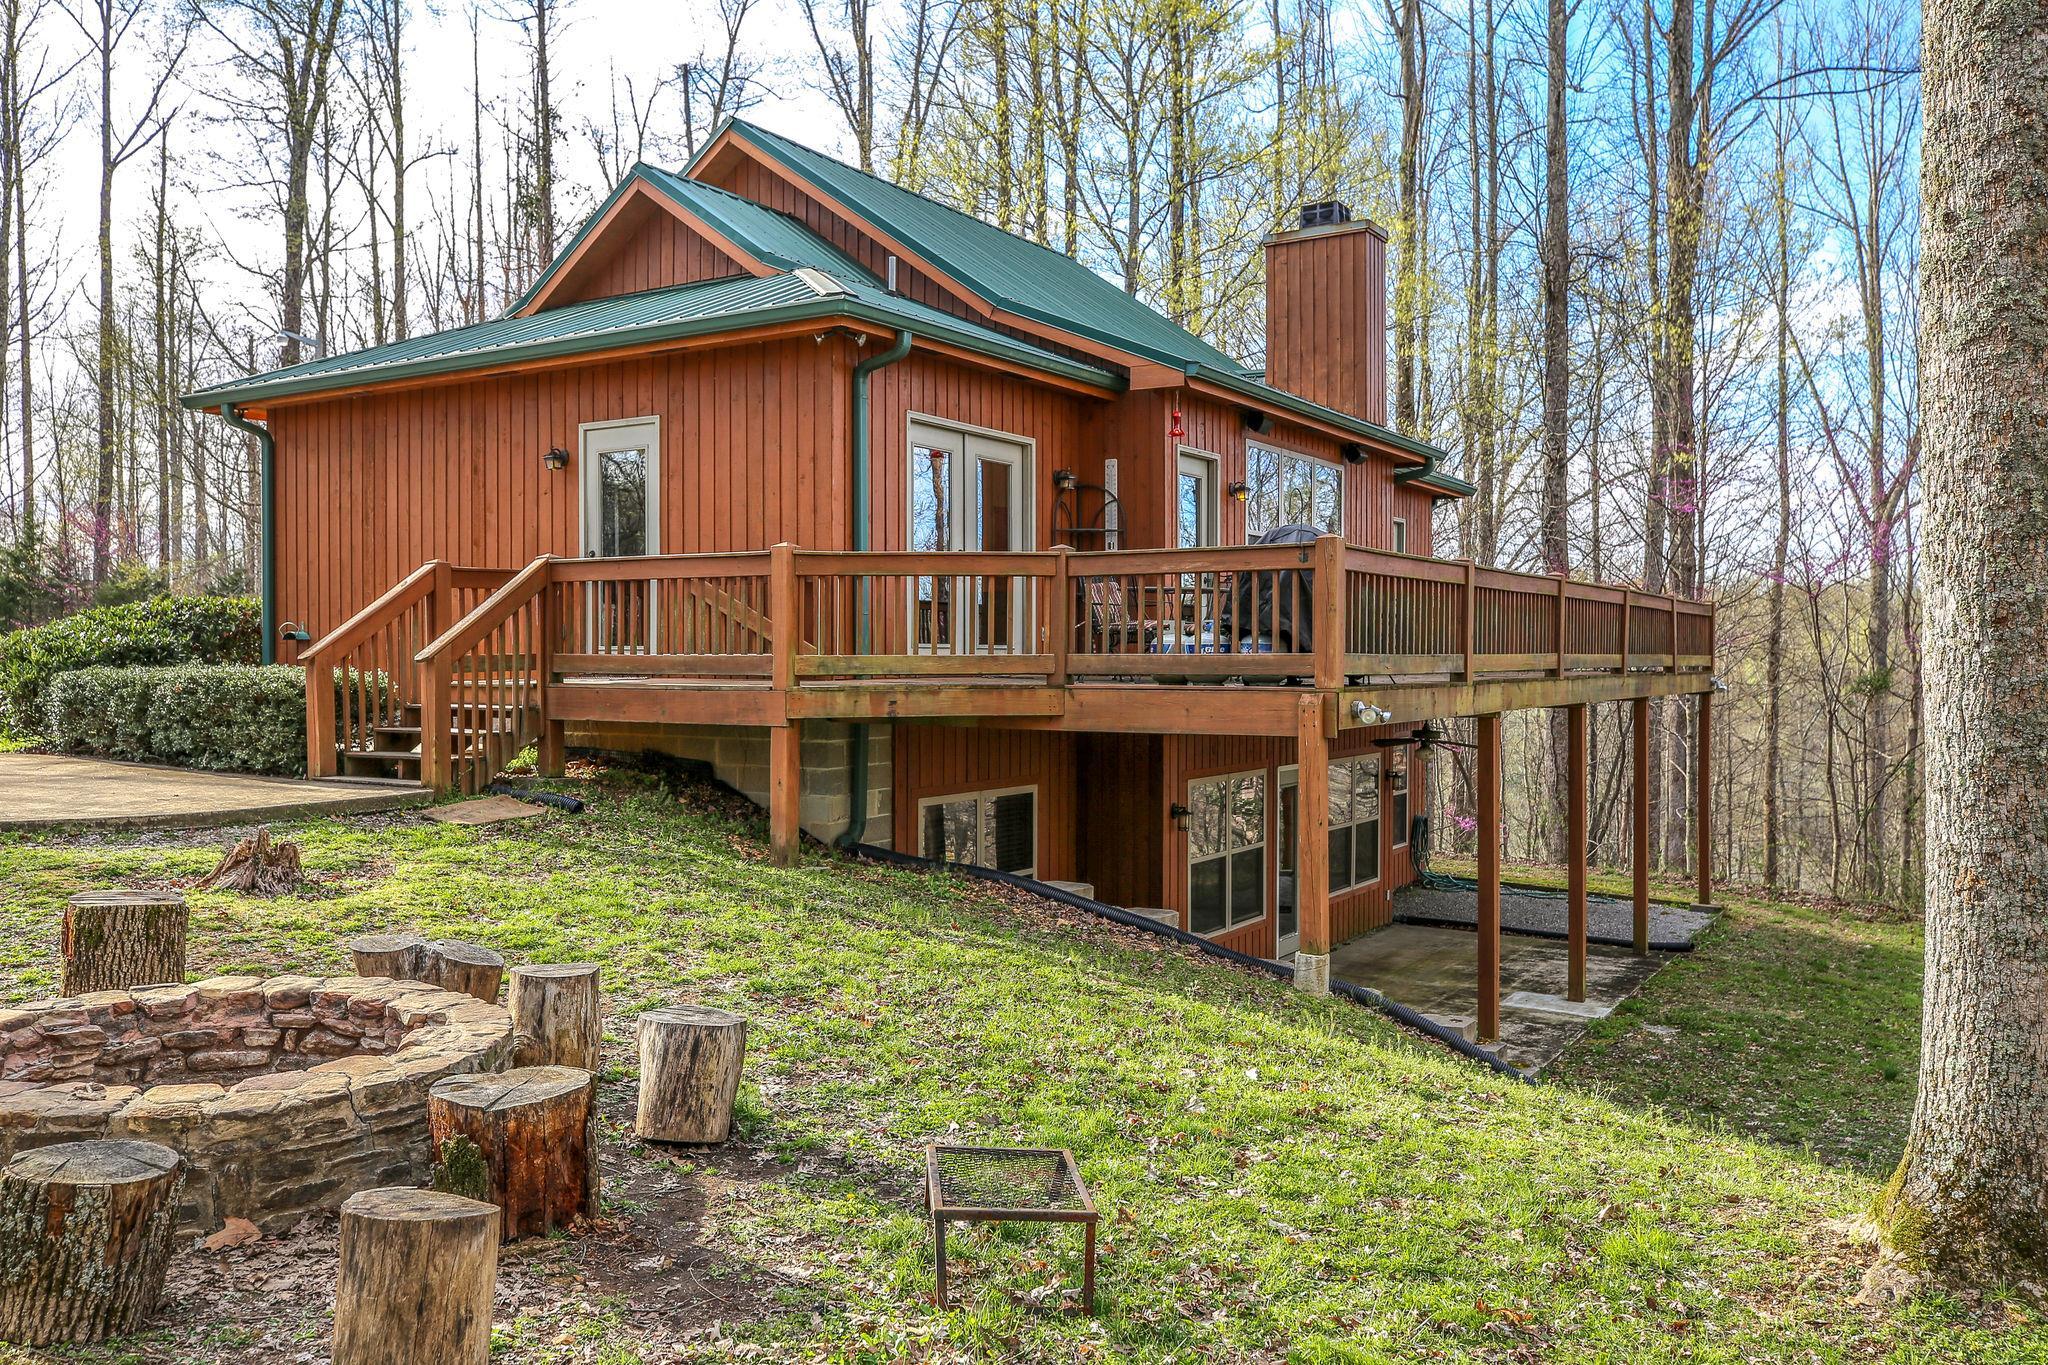 965 Harbor Dr, Lancaster, TN 38569 - Lancaster, TN real estate listing